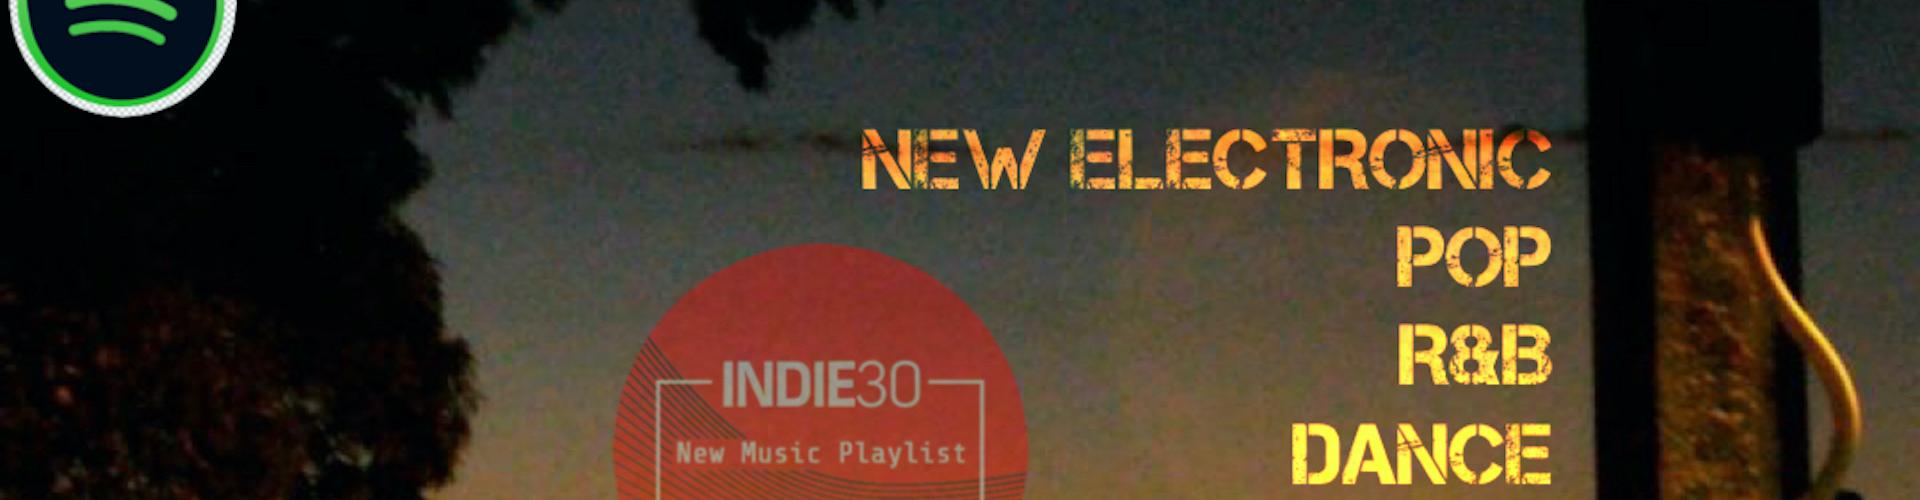 NEW-ELECTRONIC-POP-RB-DANCE-PLAYLIST-BANNER